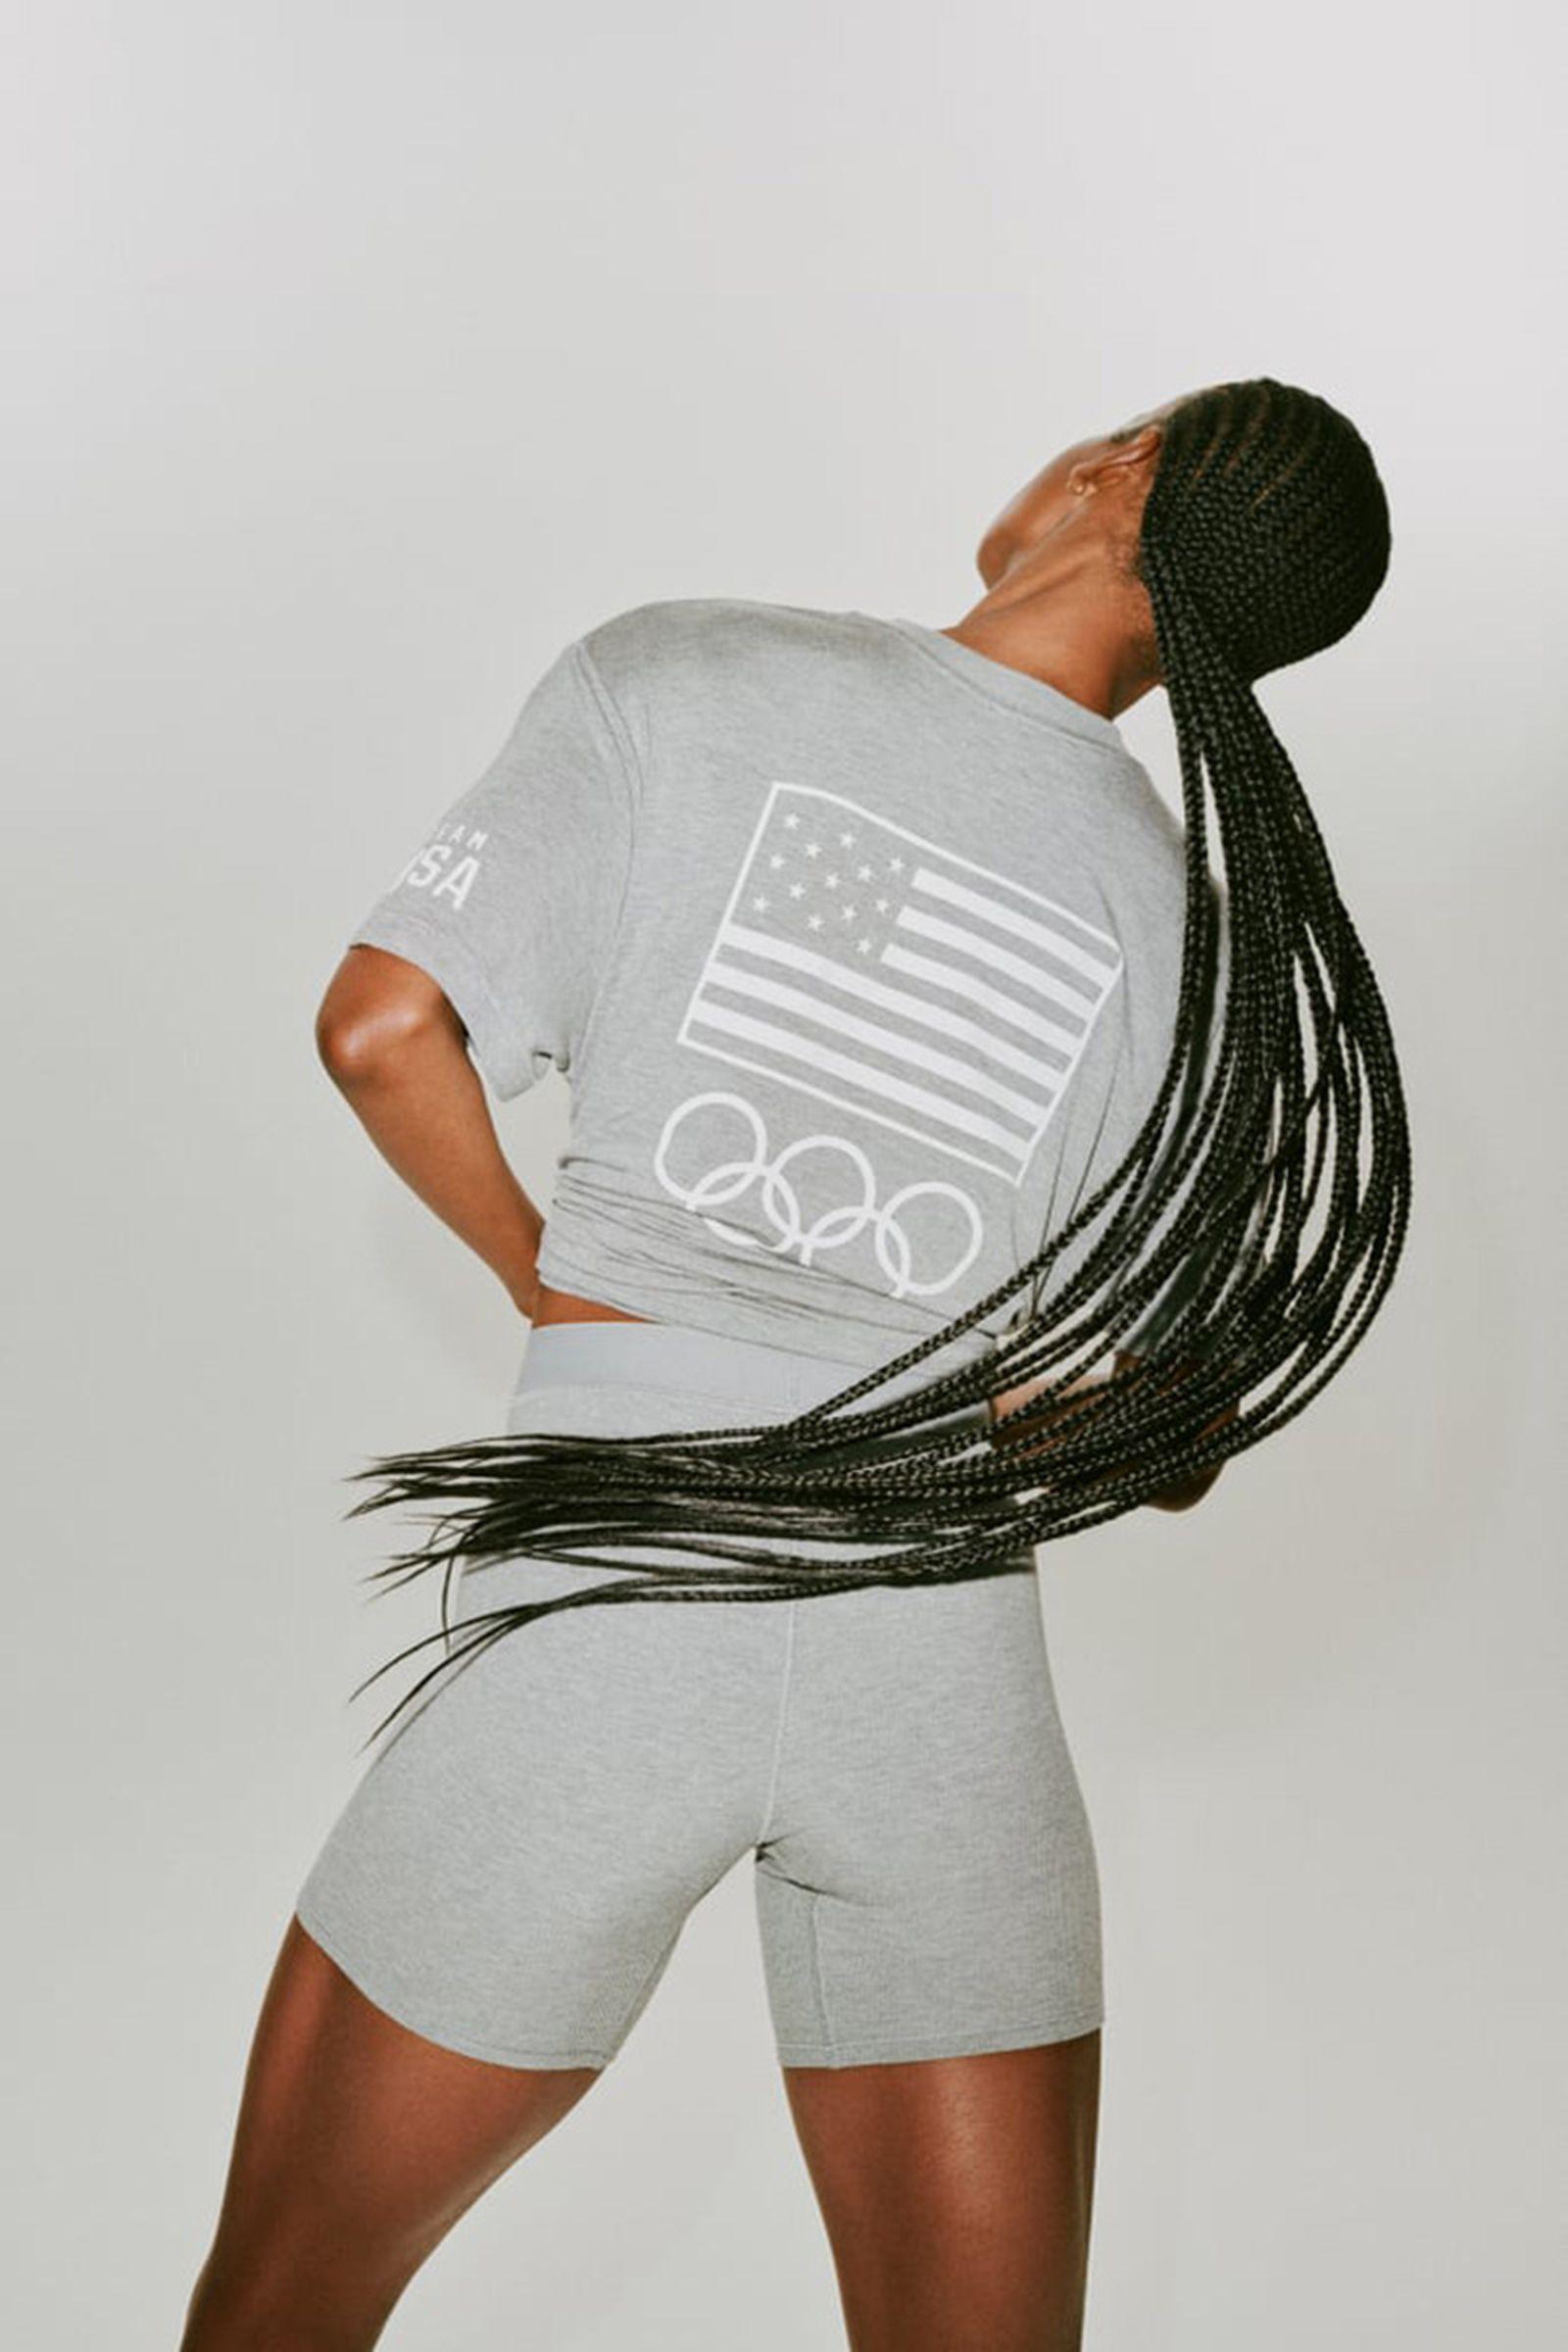 kim-kardashian-skims-tokyo-olympics-03